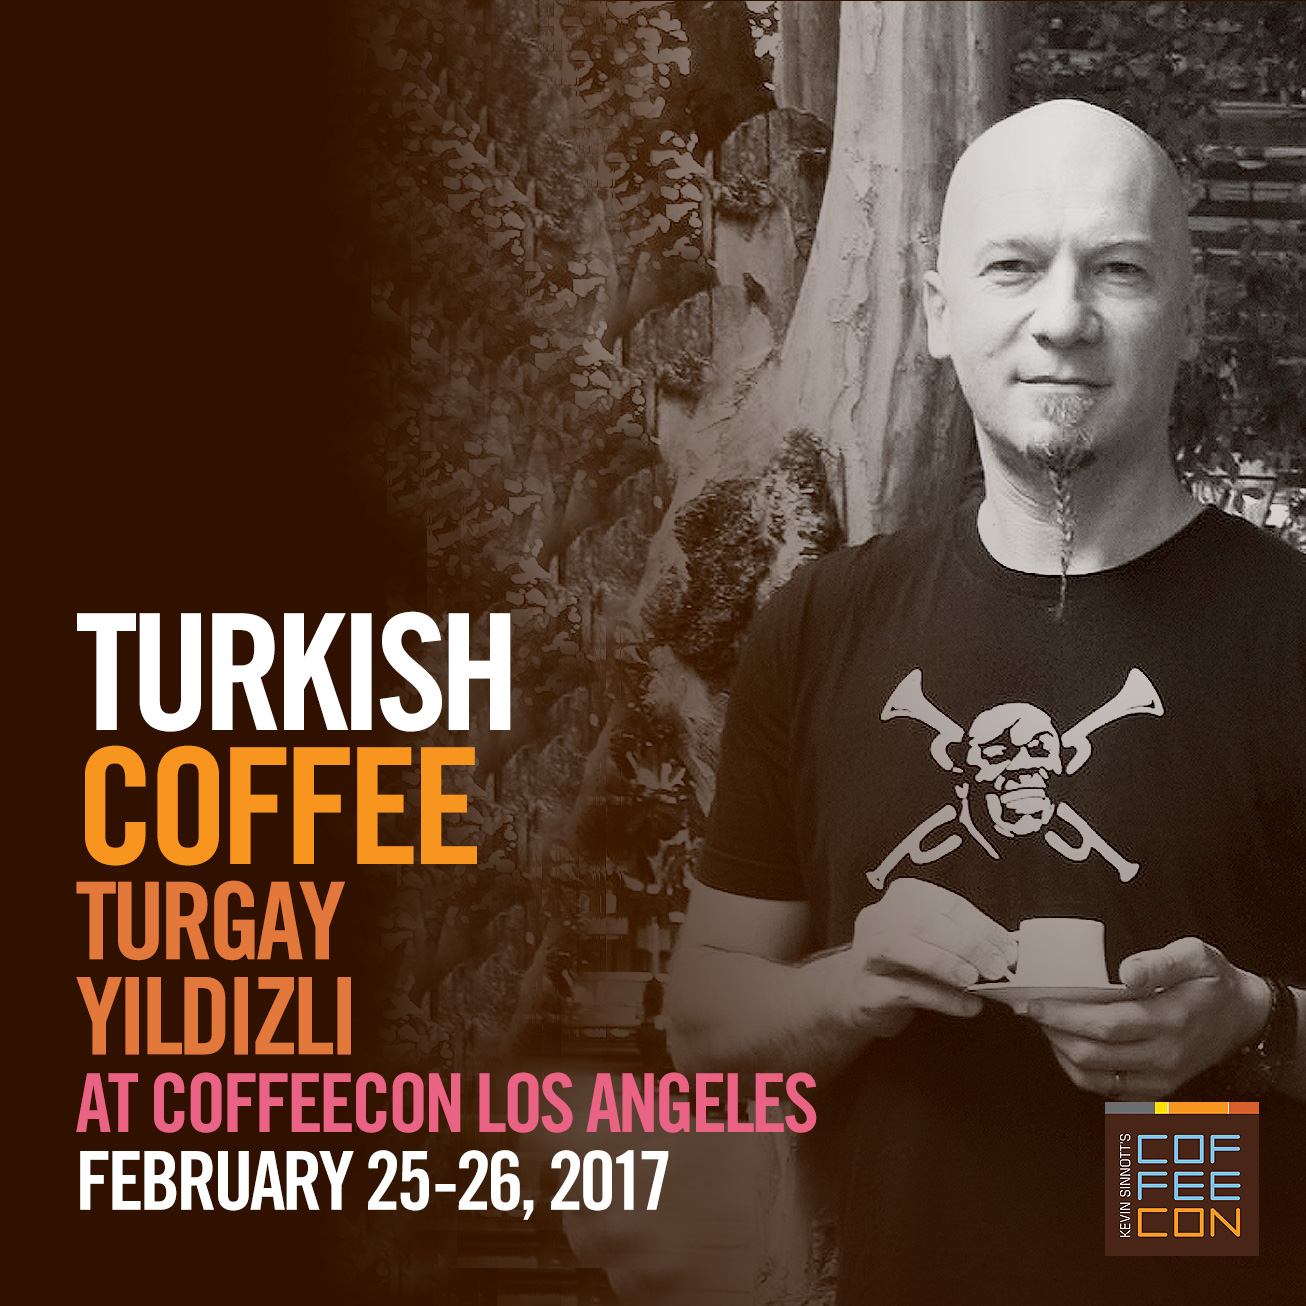 Turkish Coffee Made Specialty with Turgay Yildizli - Turkish Coffee Champion at CoffeeConLA 2017